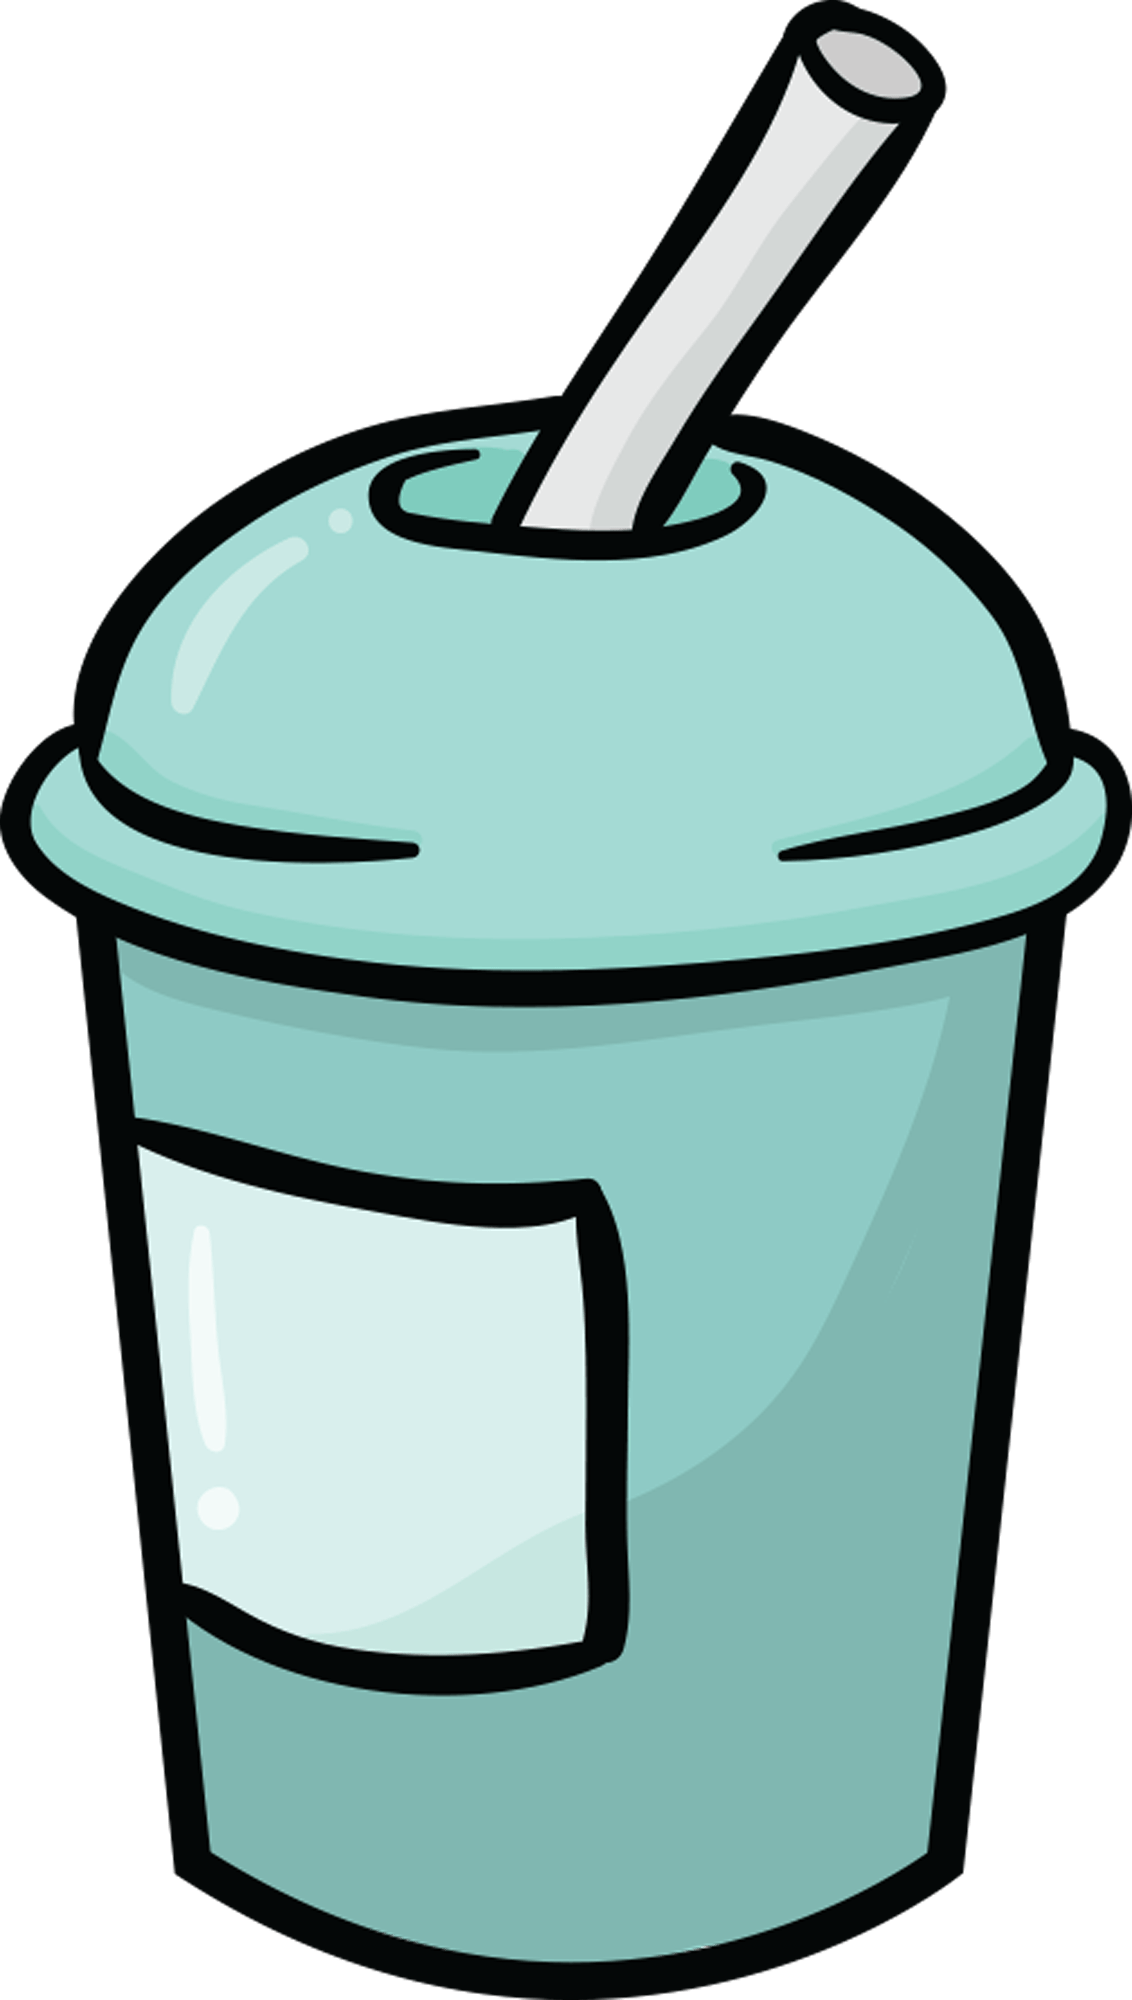 Junk Food Sticker & Emoji Pack for iMessage messages sticker-2